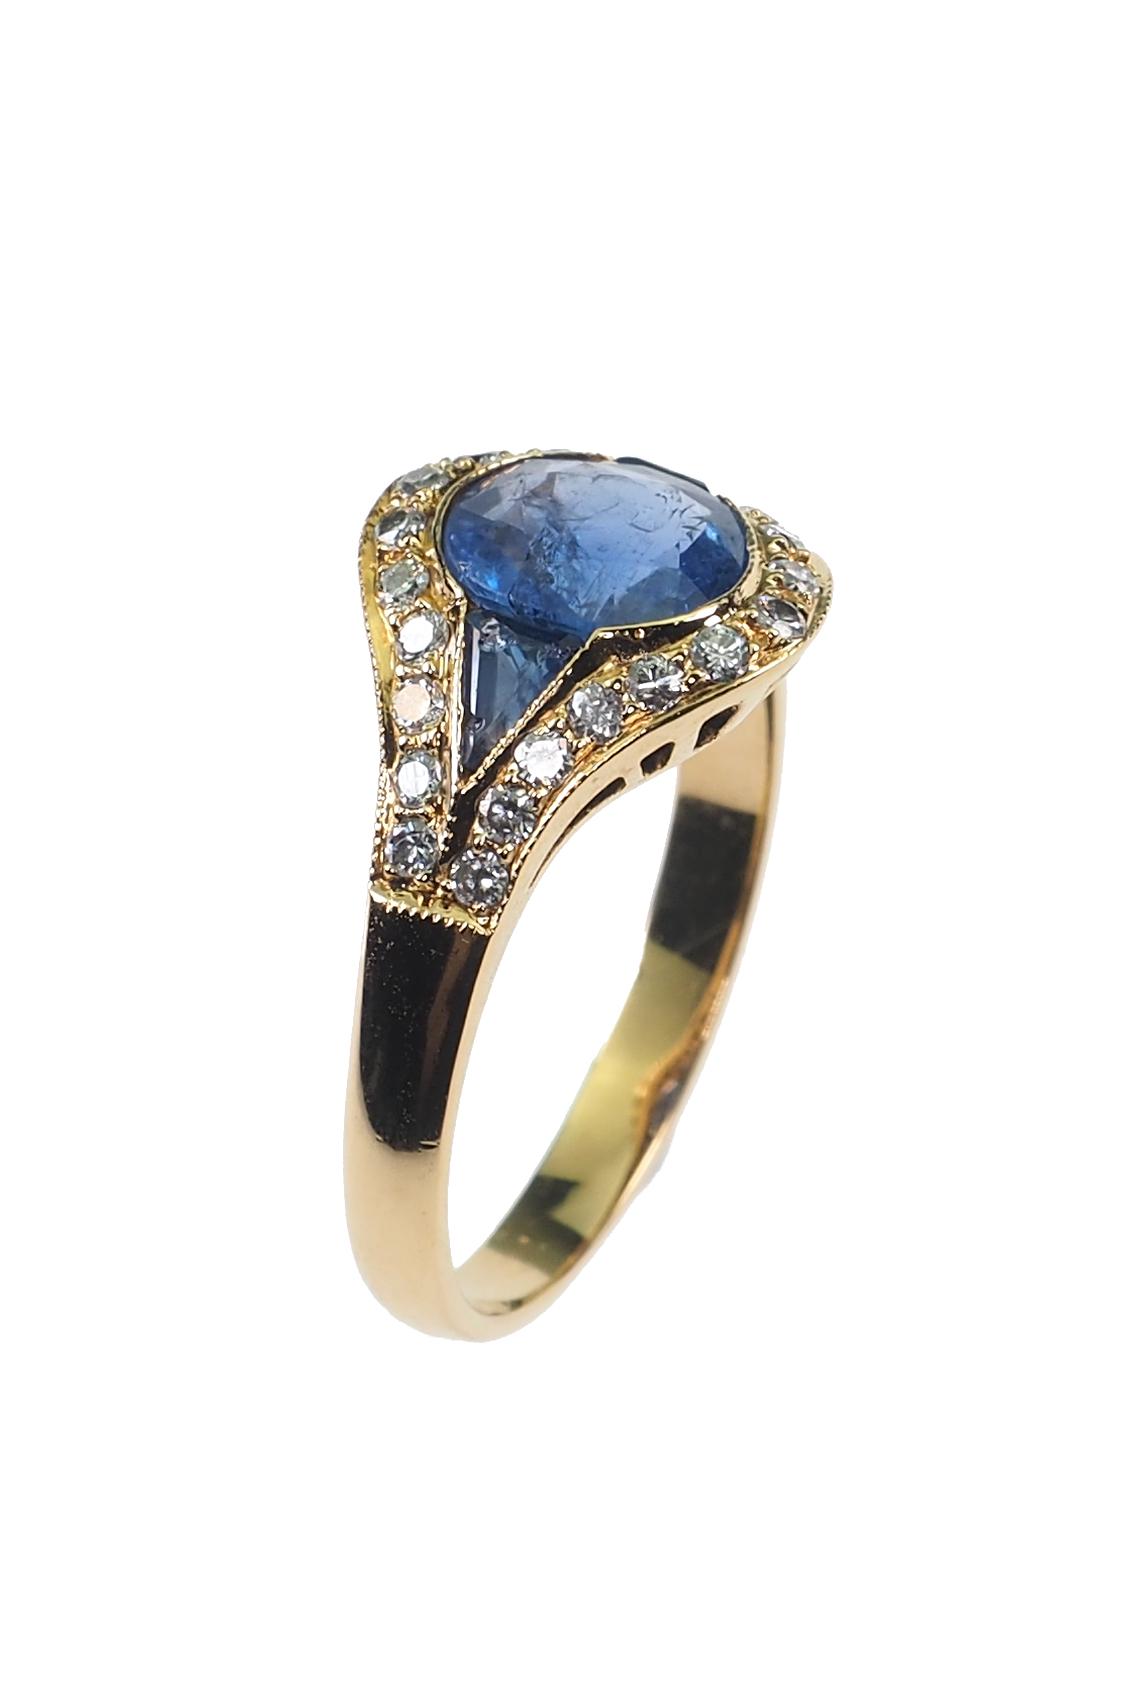 antike-Verlobungsringe-kaufen-0362b